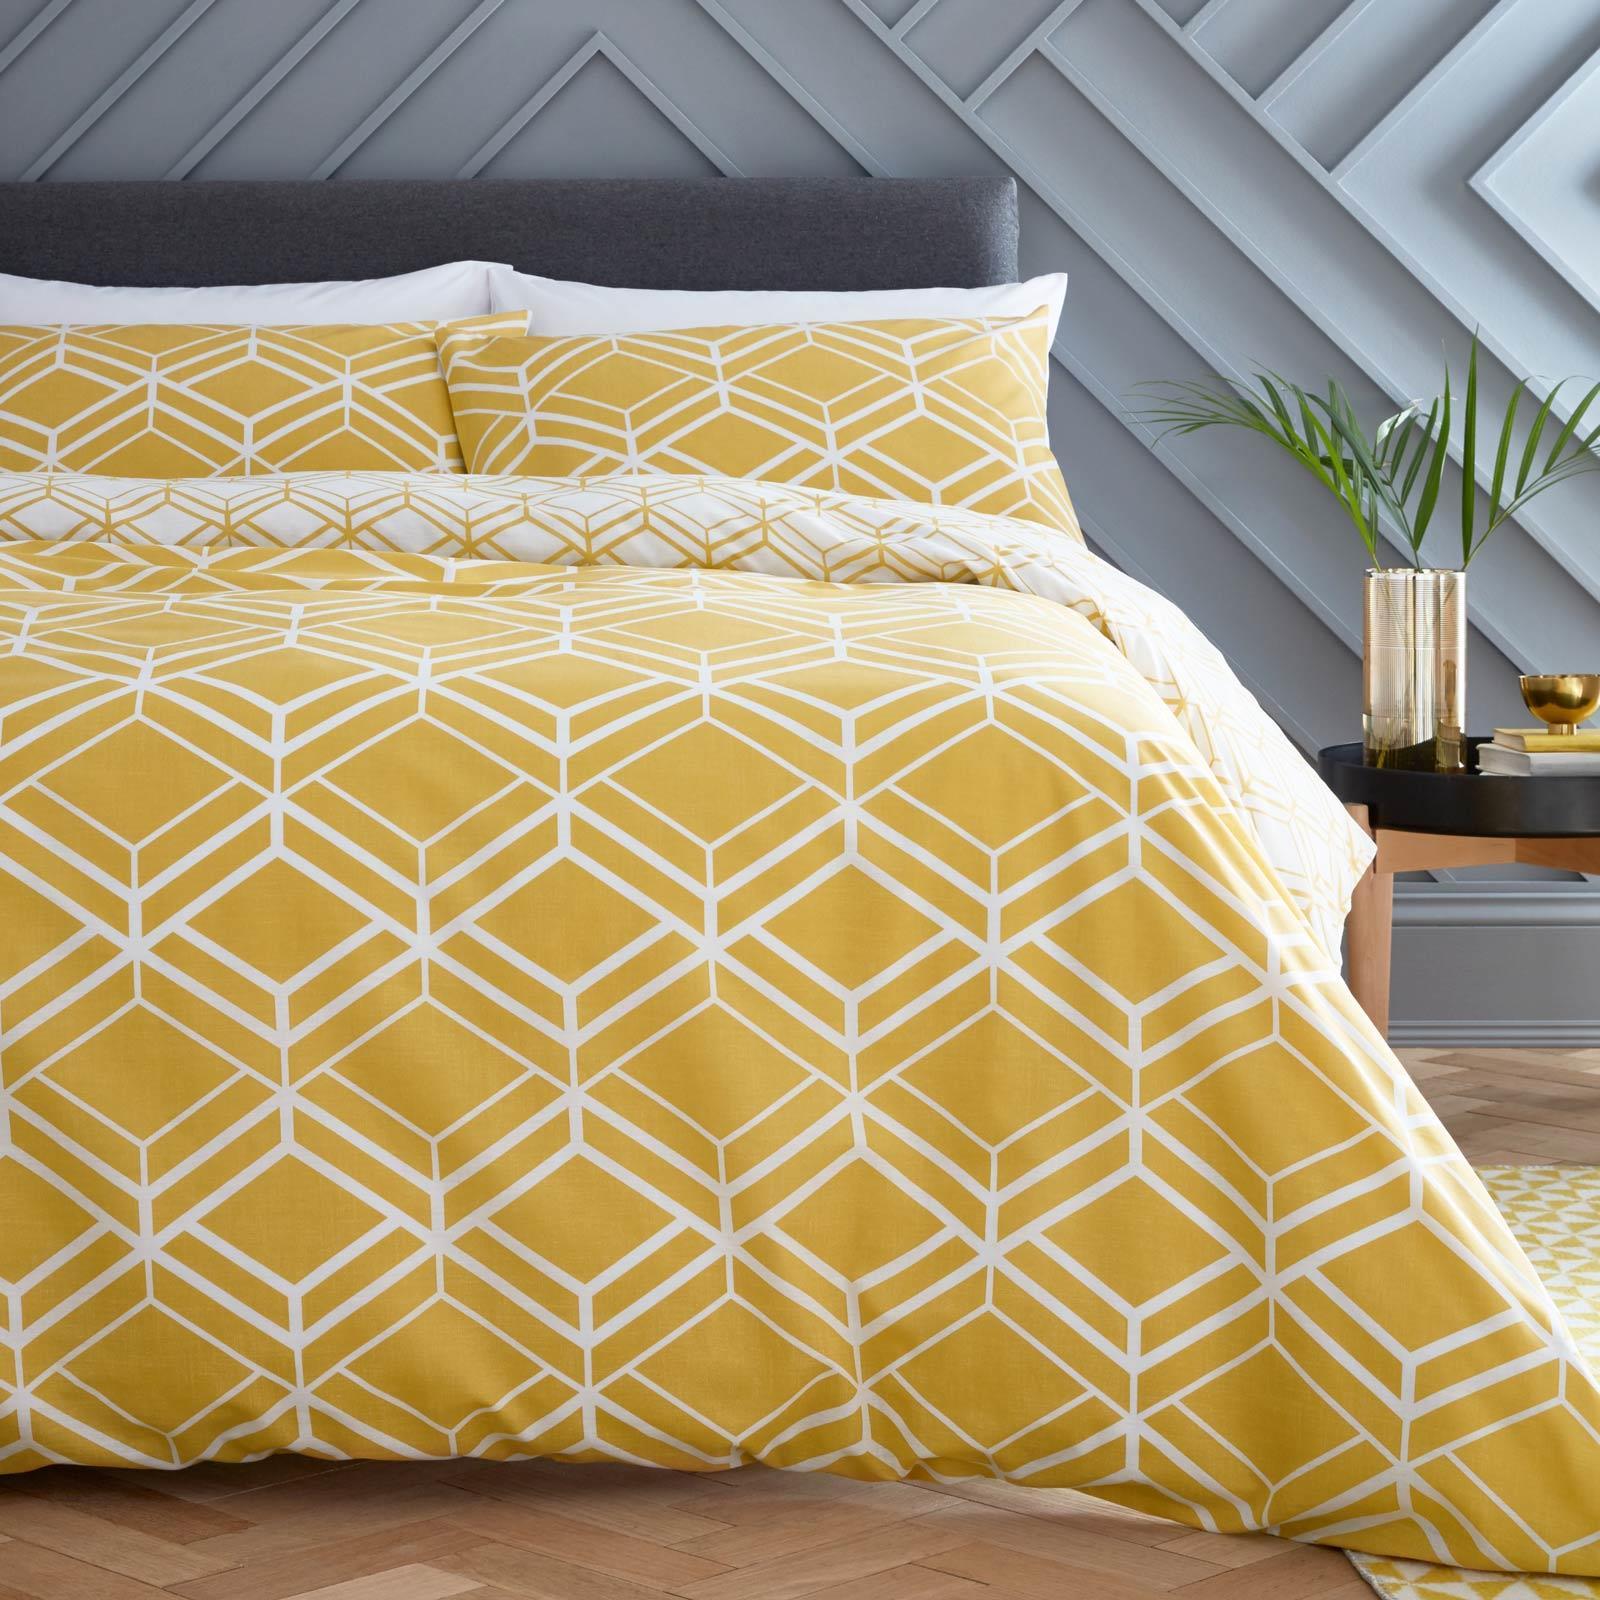 Beddengoed Bedlinnen Geo Floral Orche Duvet Cover Set Quilt Bedding Pillowcase Single Double King Huis Tecnomira Com Br